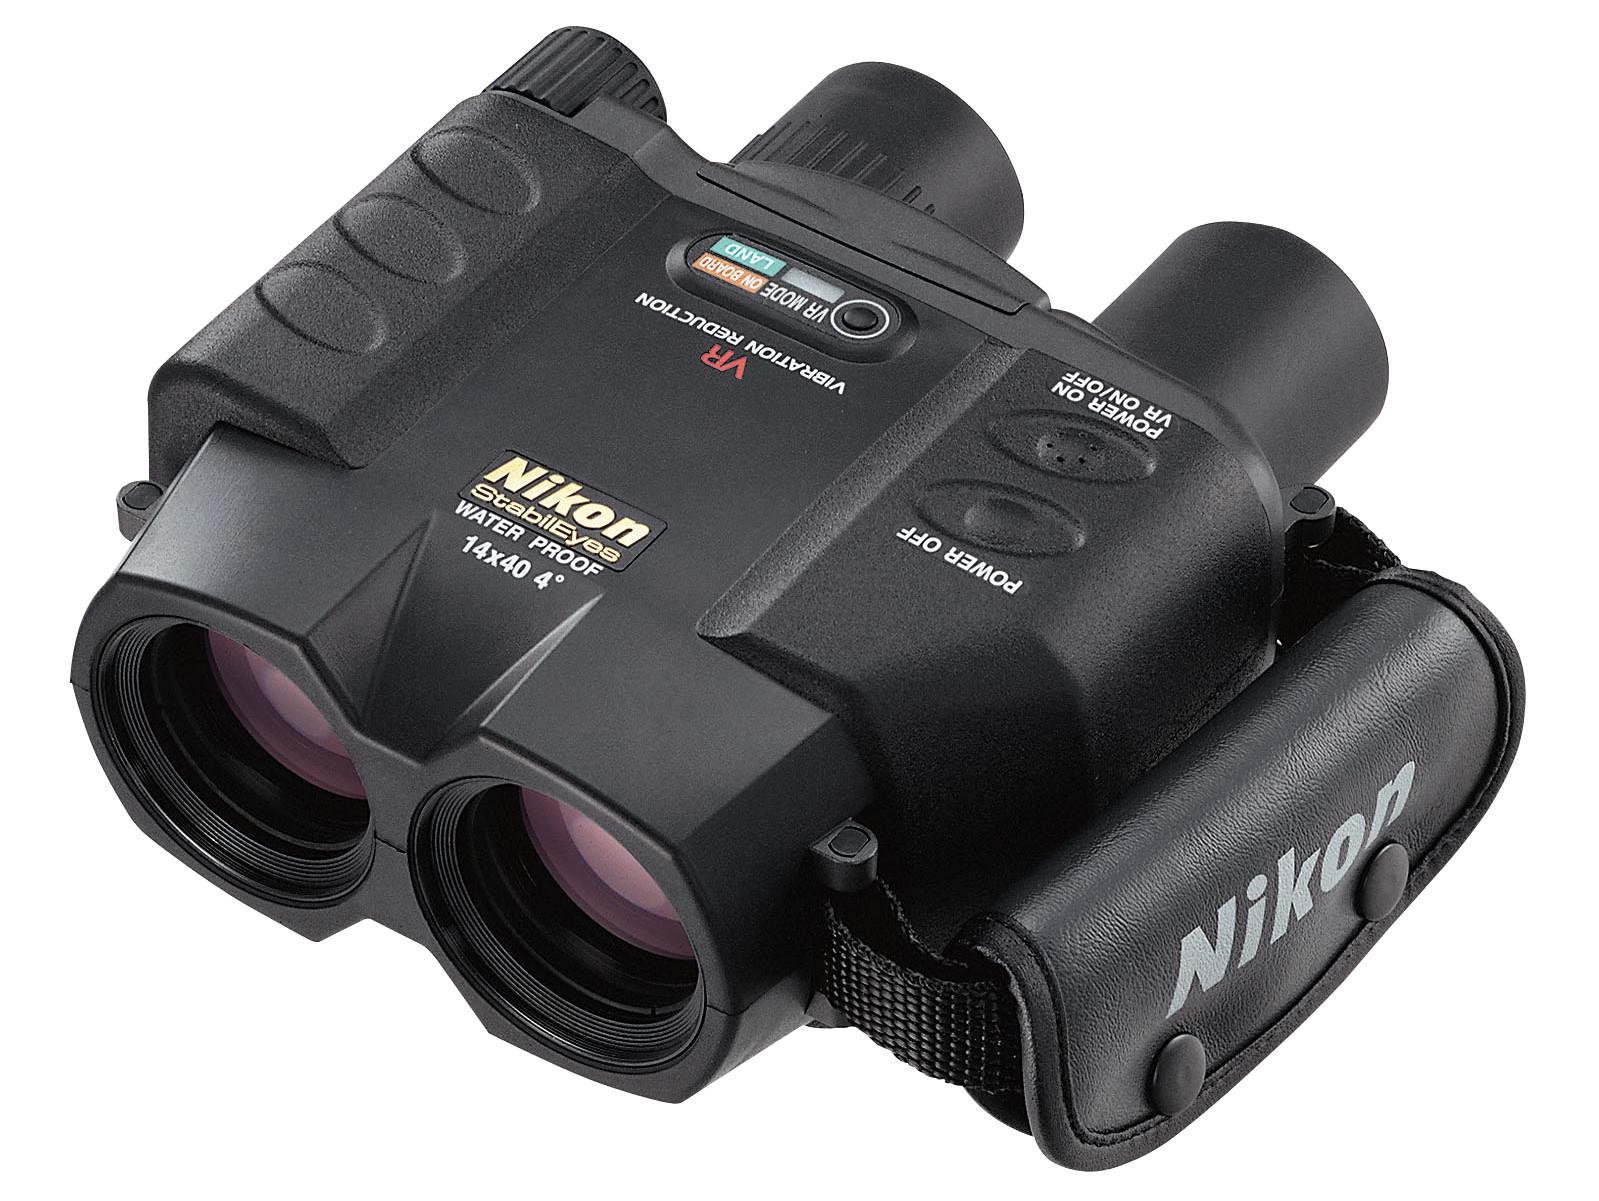 StabilEyes 14X40 避震型望遠鏡 雙筒望遠鏡/單眼鏡-登山賞鳥